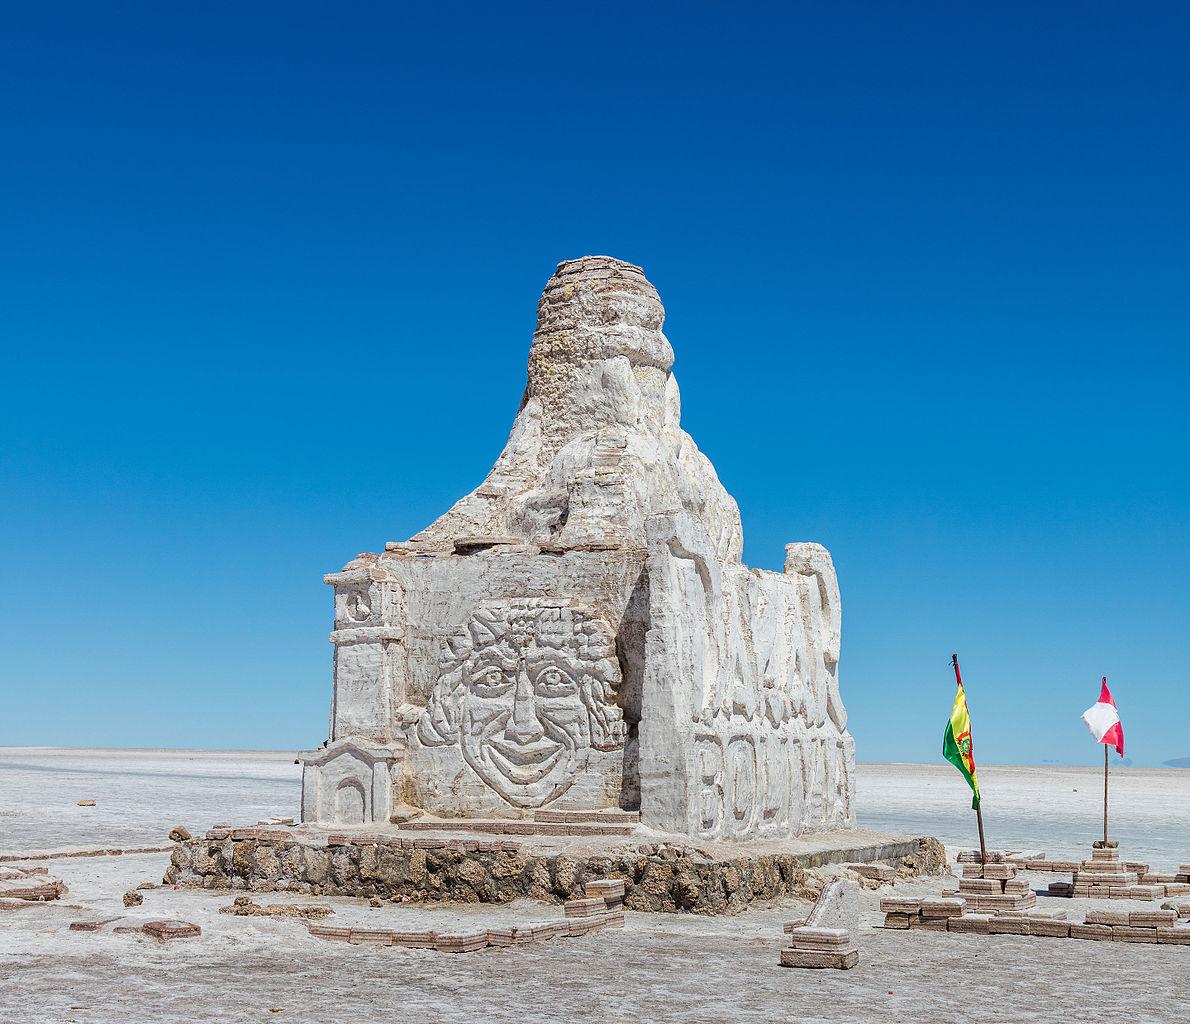 See See Motorcycles >> File:Monumento al Dakar, Salar de Uyuni, Bolivia, 2016-02-04, DD 46.JPG - Wikipedia